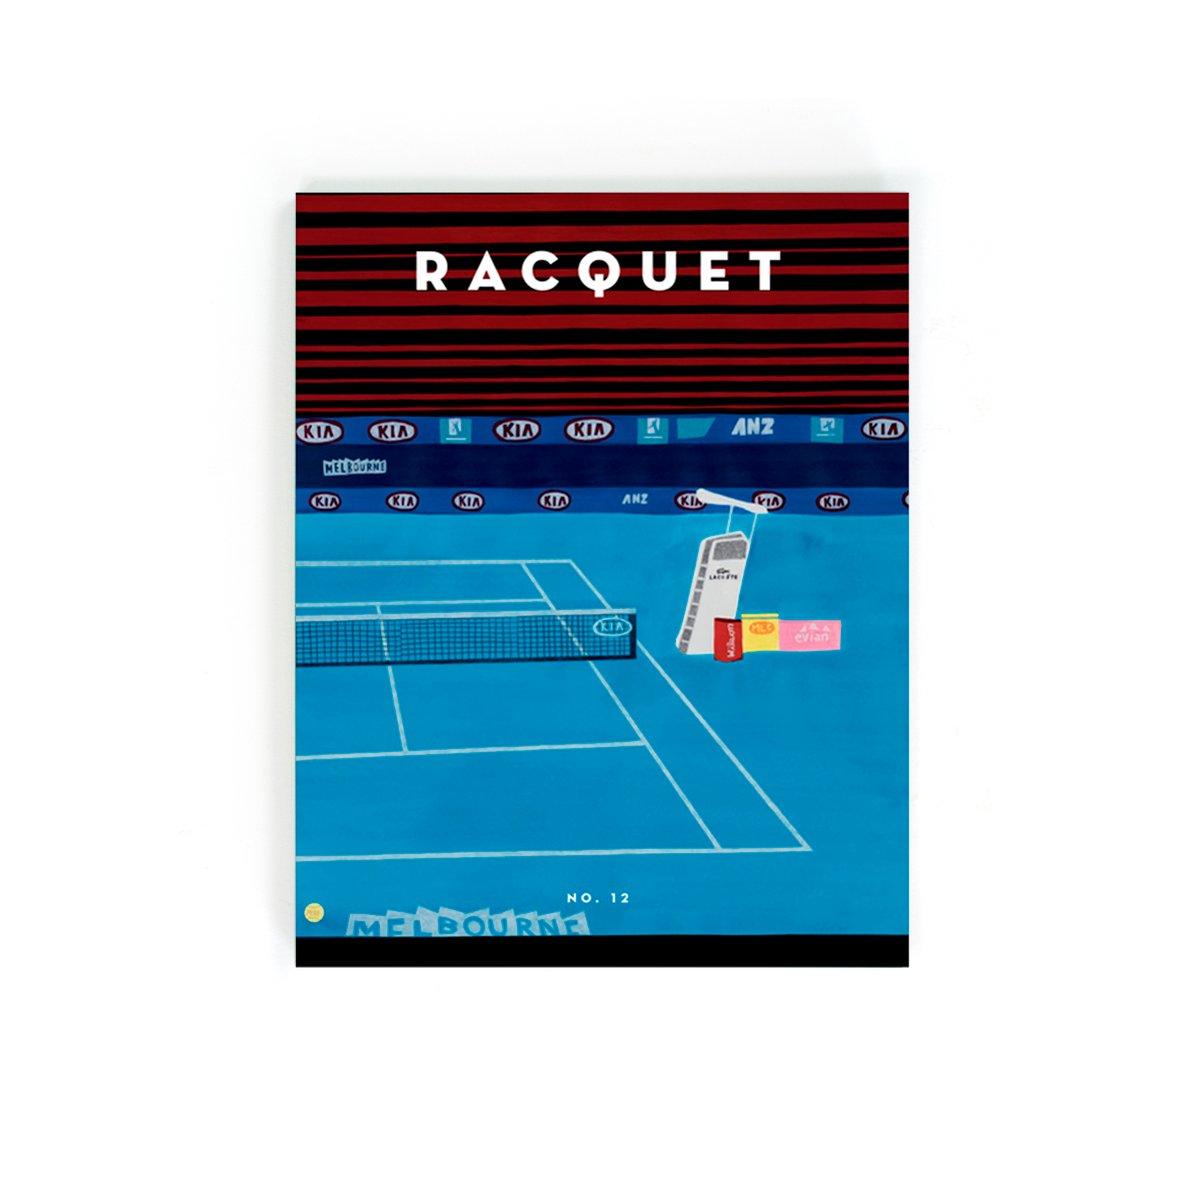 Image of Racquet Magazine